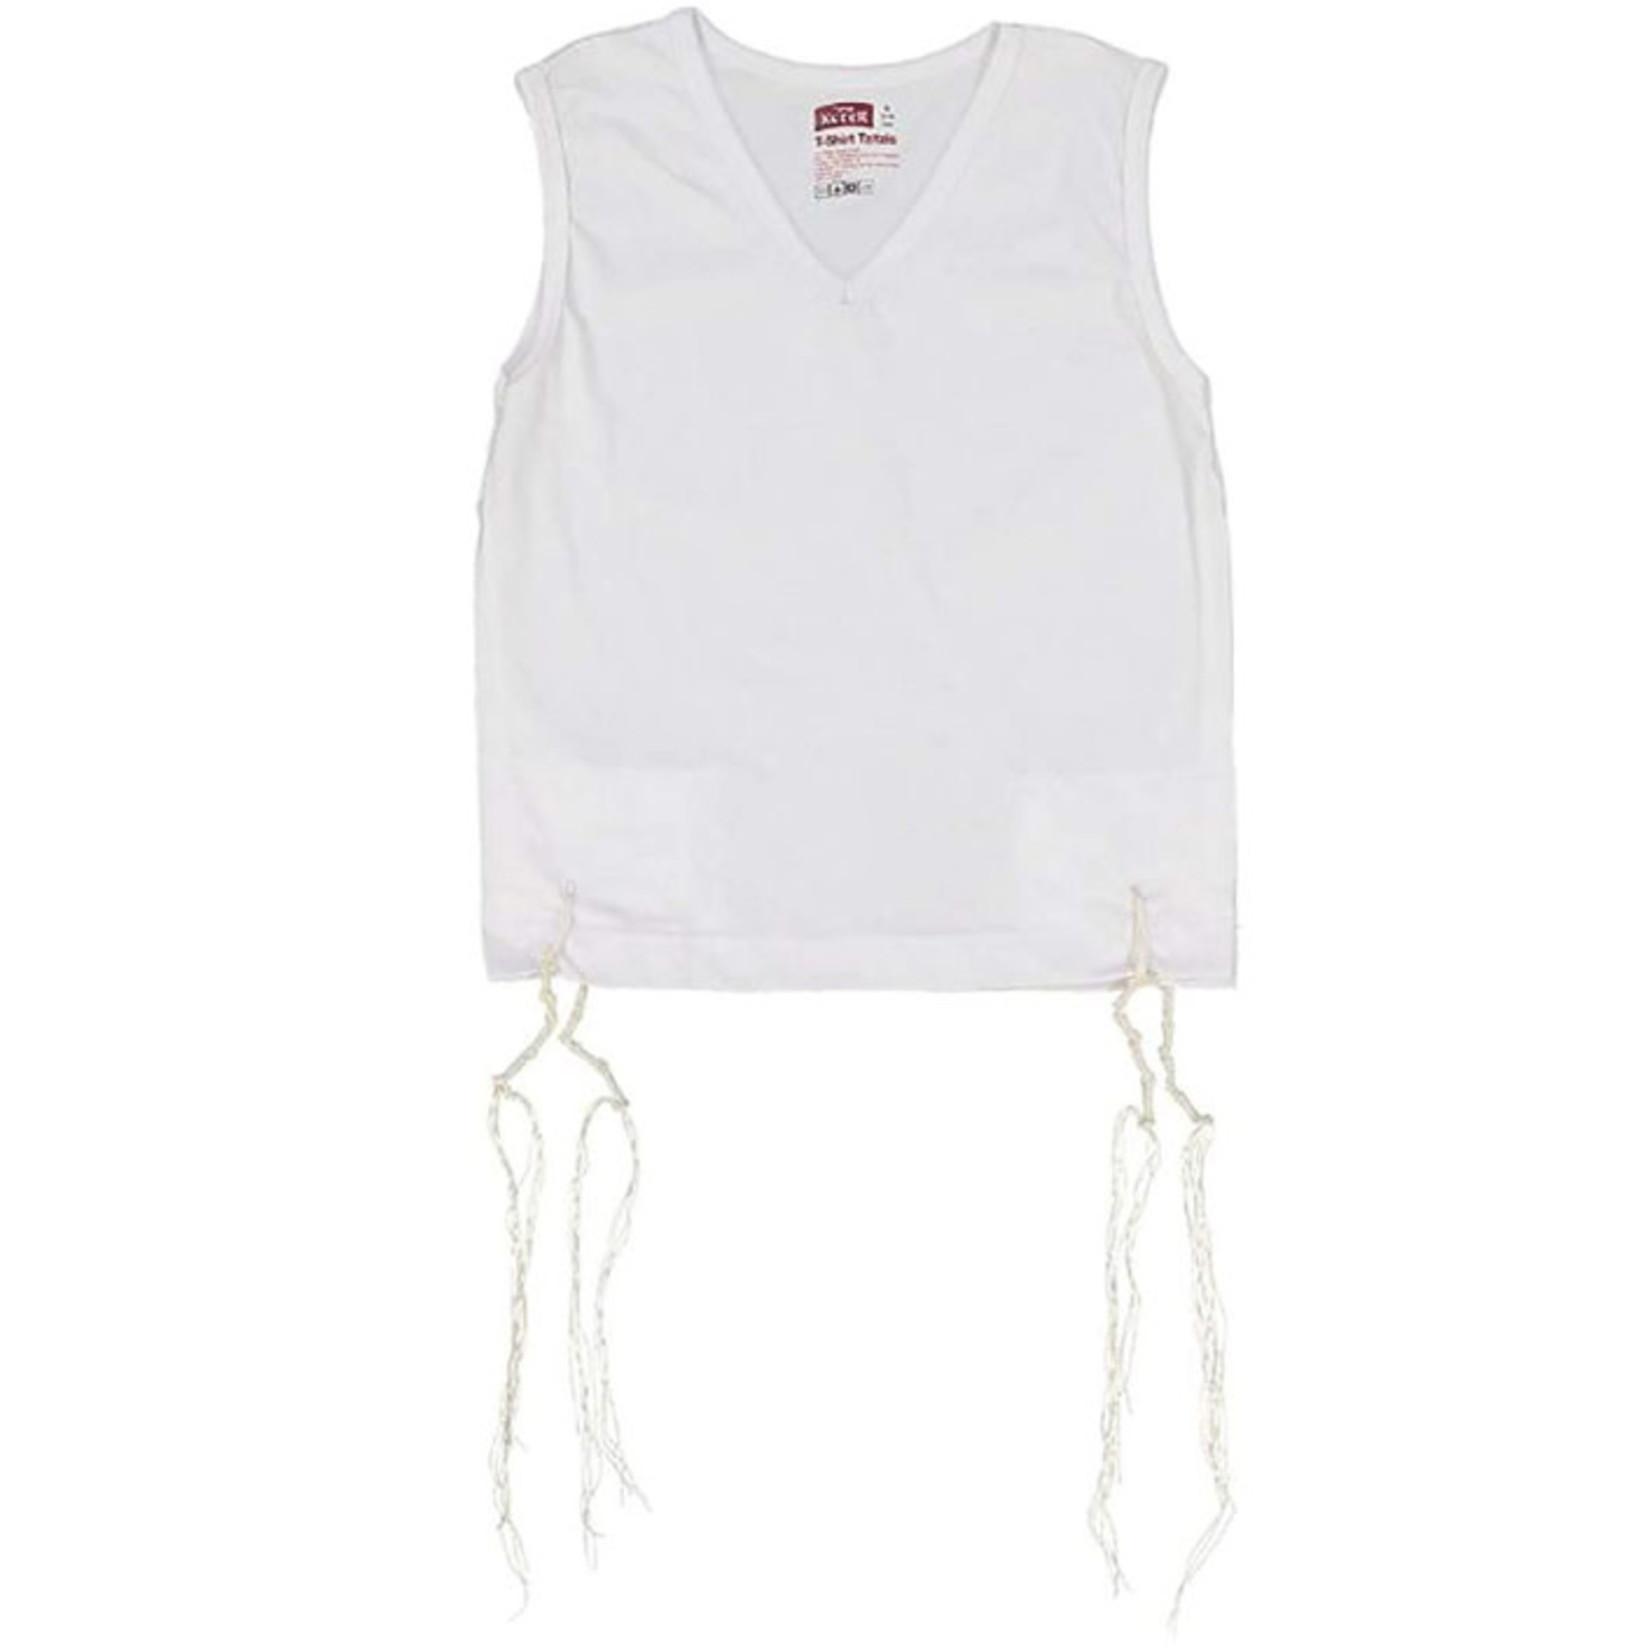 Undershirt-Style Arbah Kanfot, 100% Cotton, V-Neck, Size 7